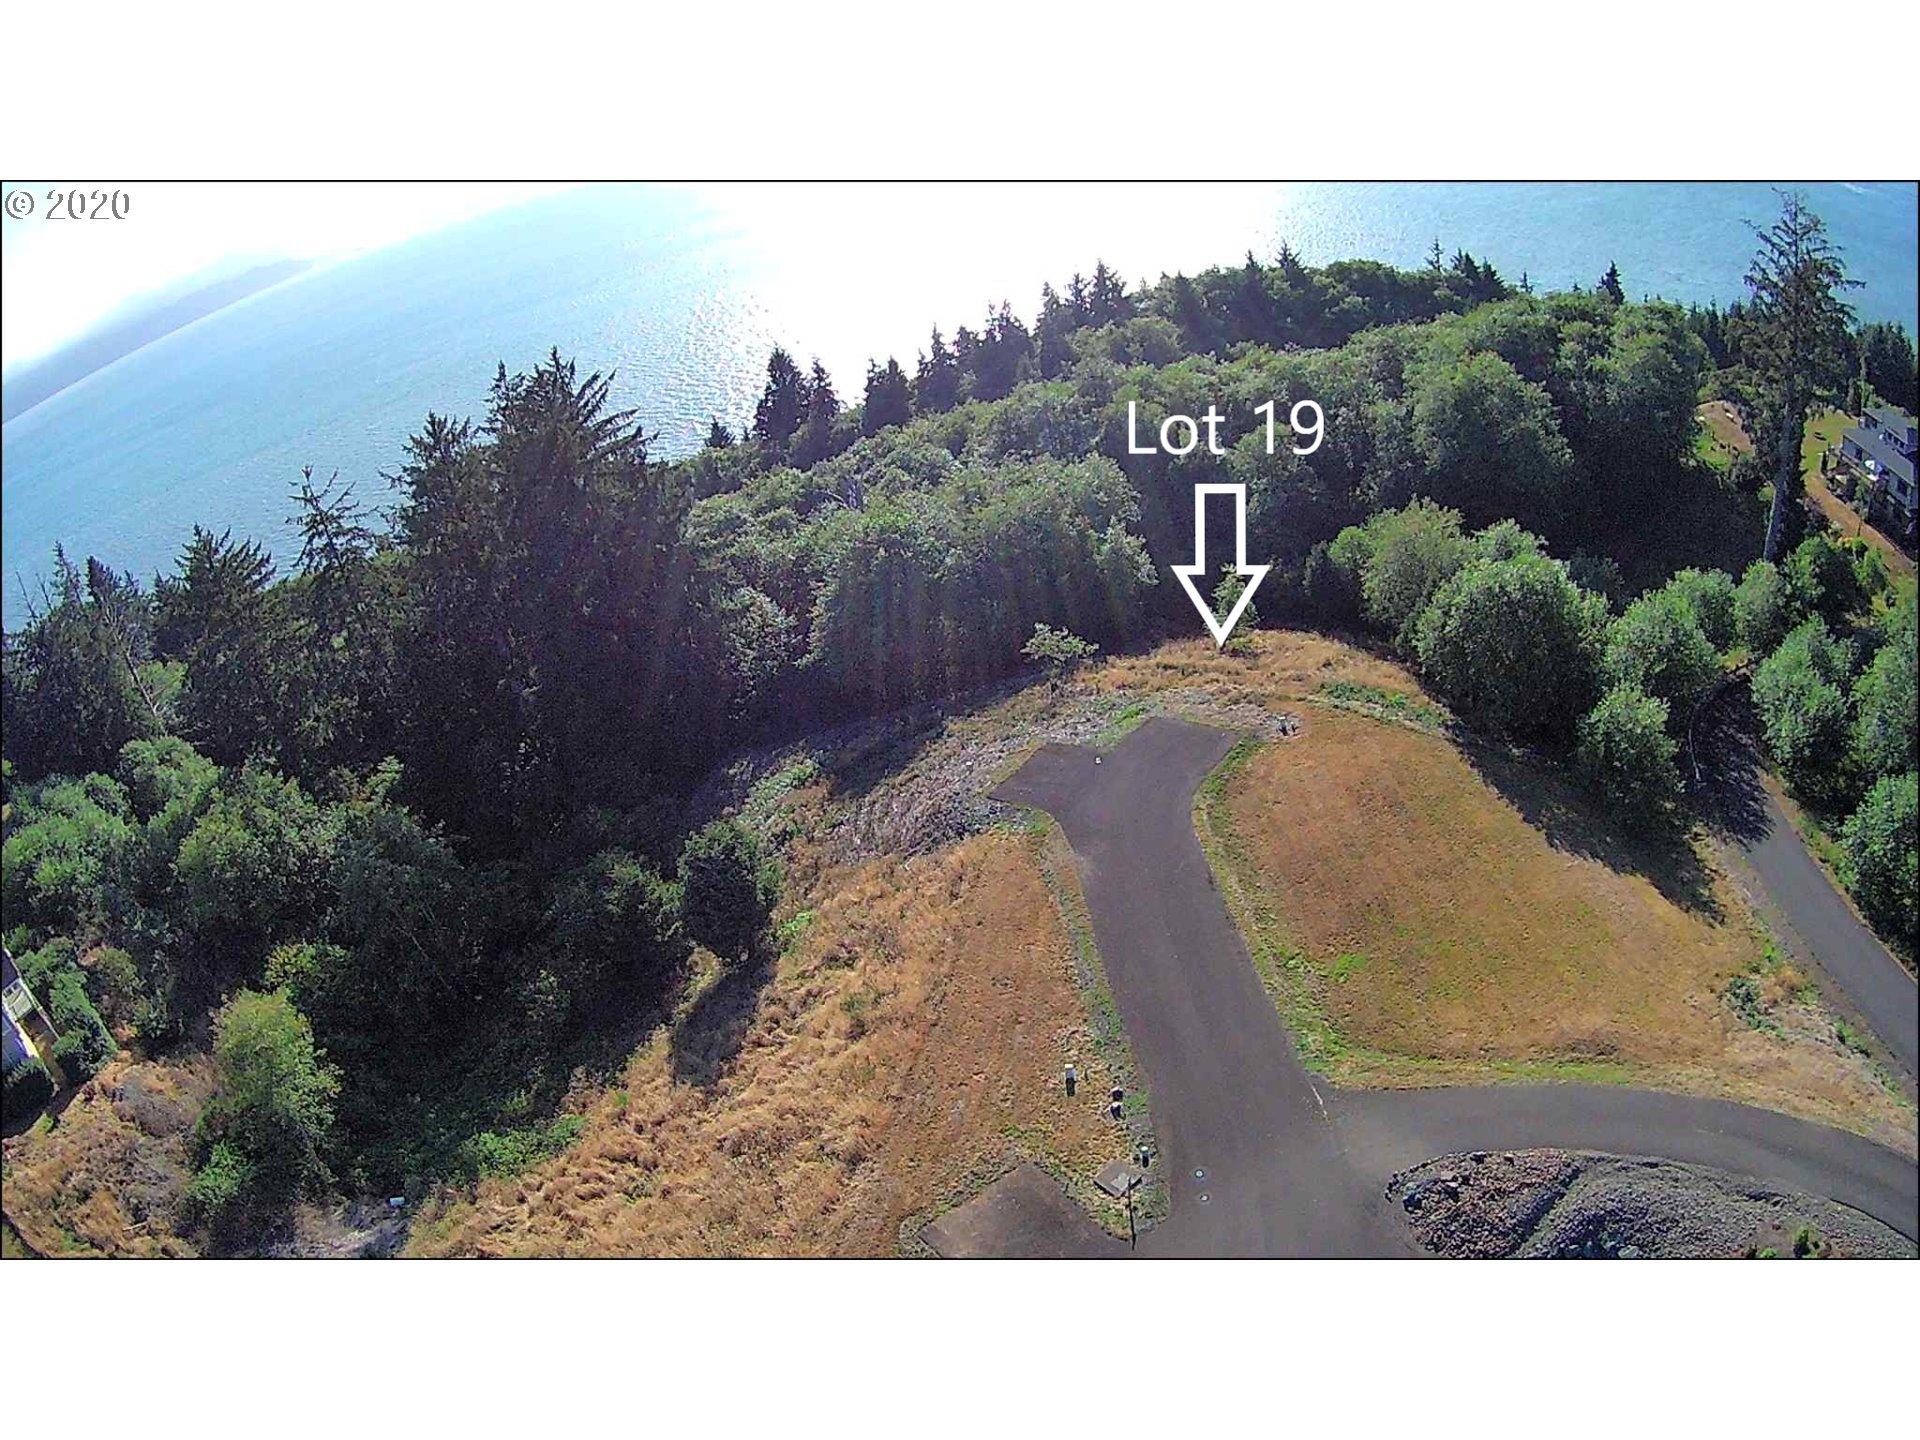 North Ridge D Lot19, Bay City, Oregon 97107, ,Lots And Land,For Sale,North Ridge D Lot19,20077697